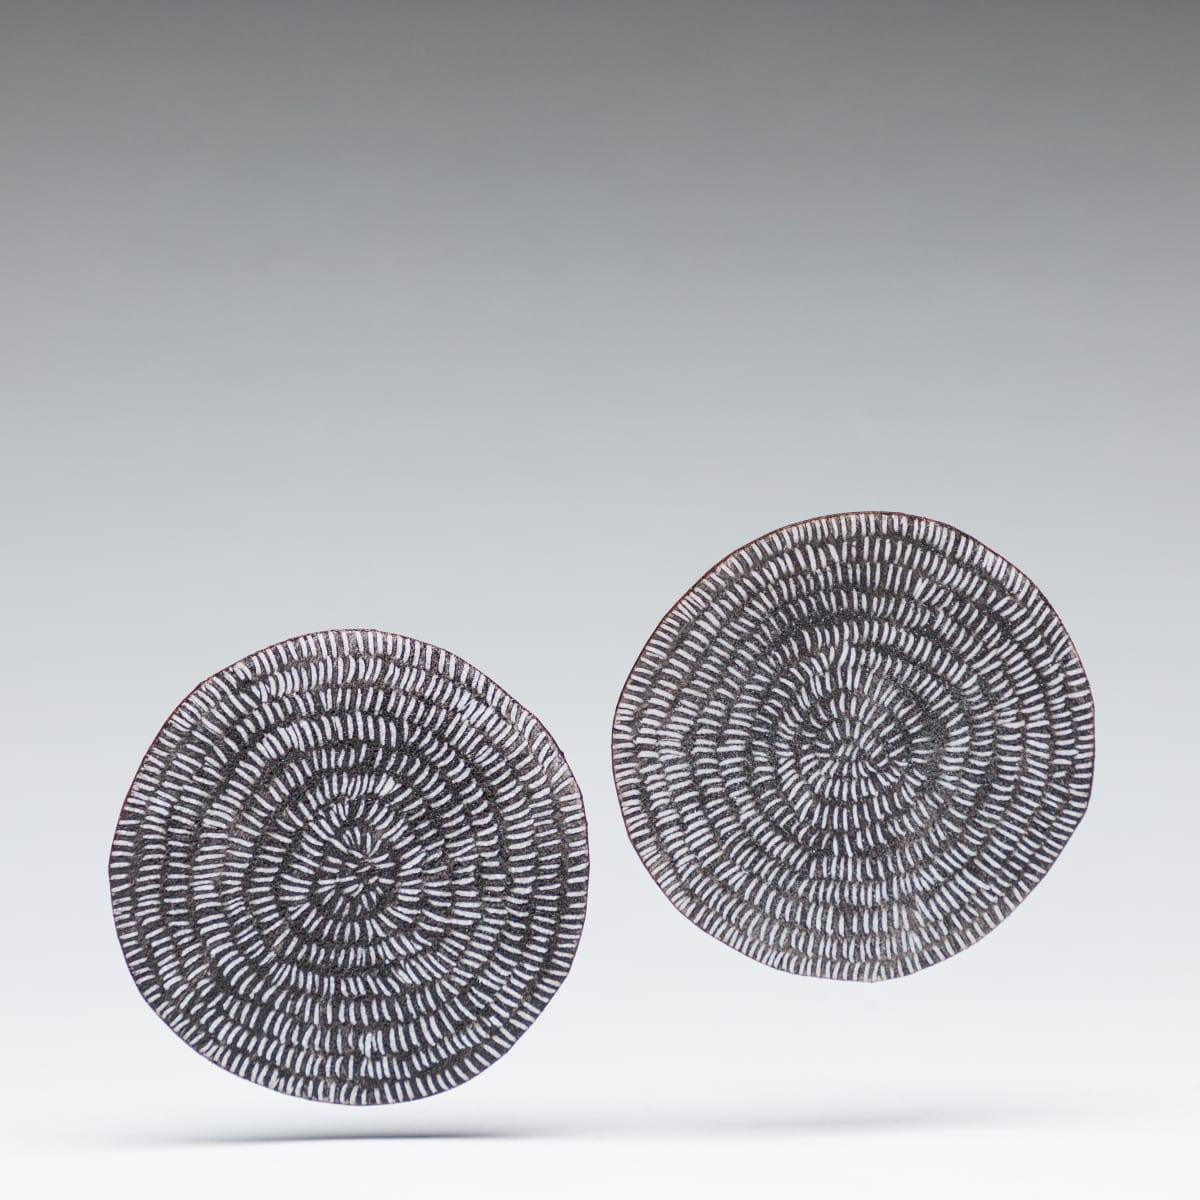 Tanya Crane, Round Sgraffito Earrlings-Black and White, 2019